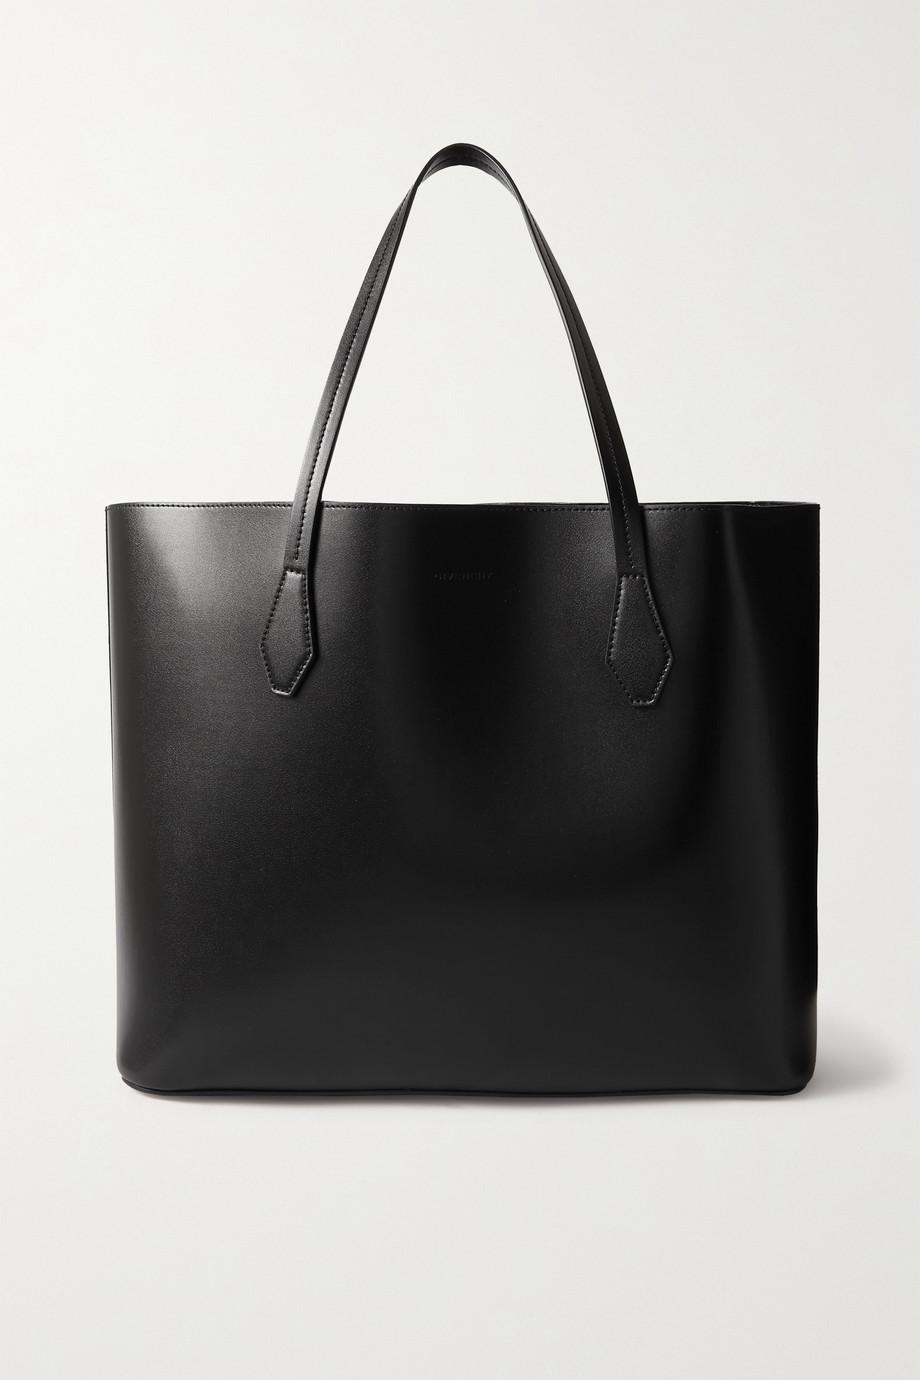 Givenchy Sac à main en cuir Wing